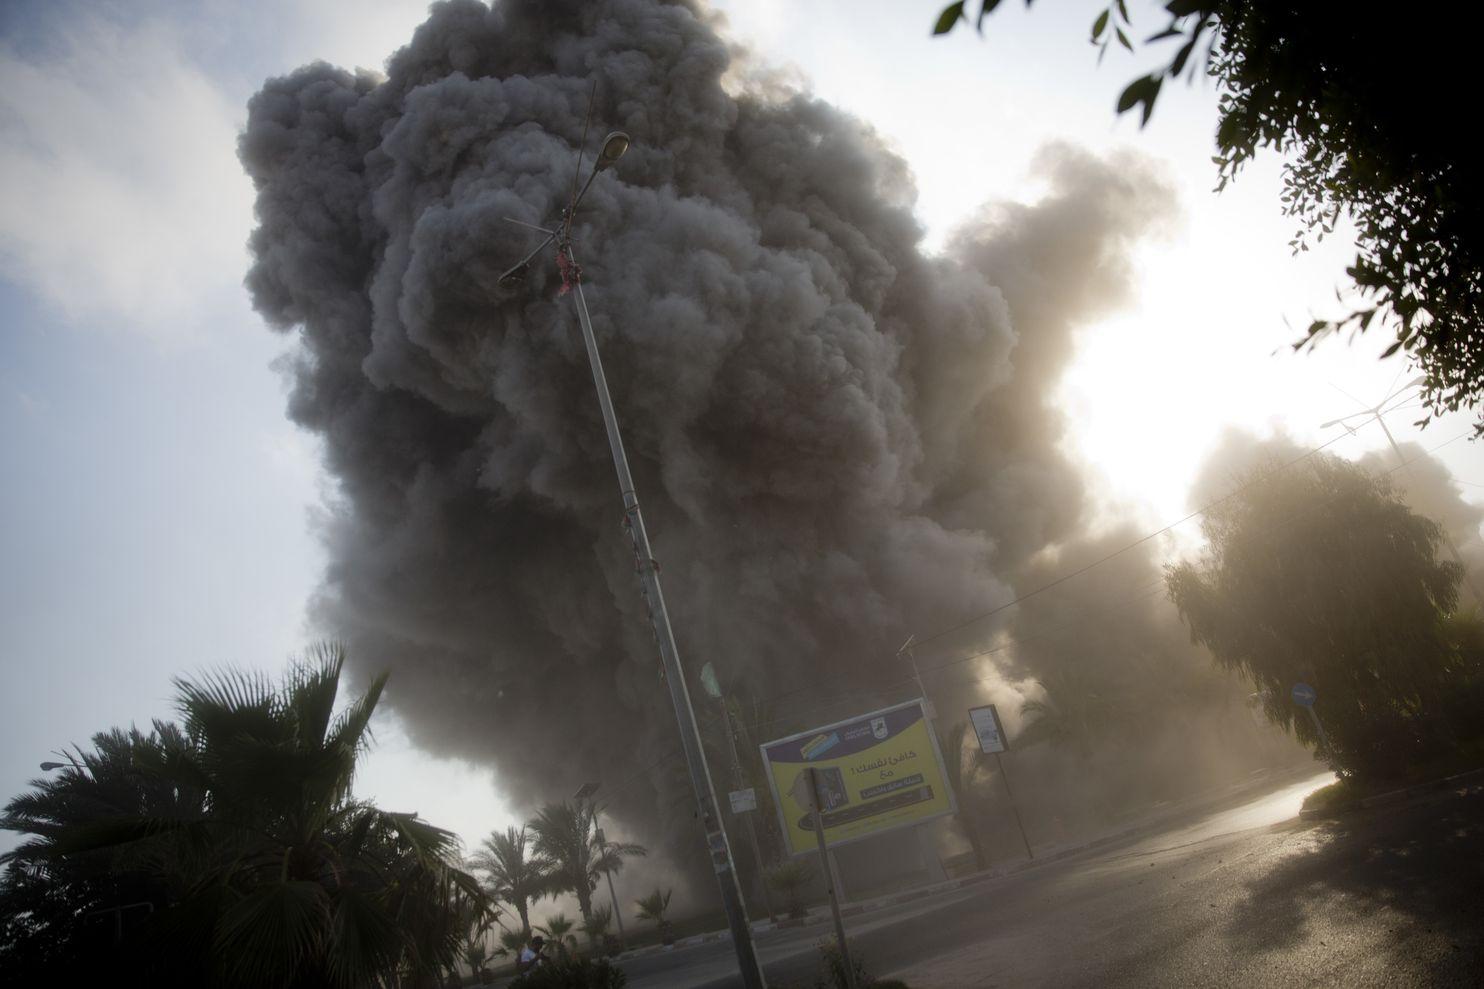 Israeli-Gaza border violence worst since 2014 war